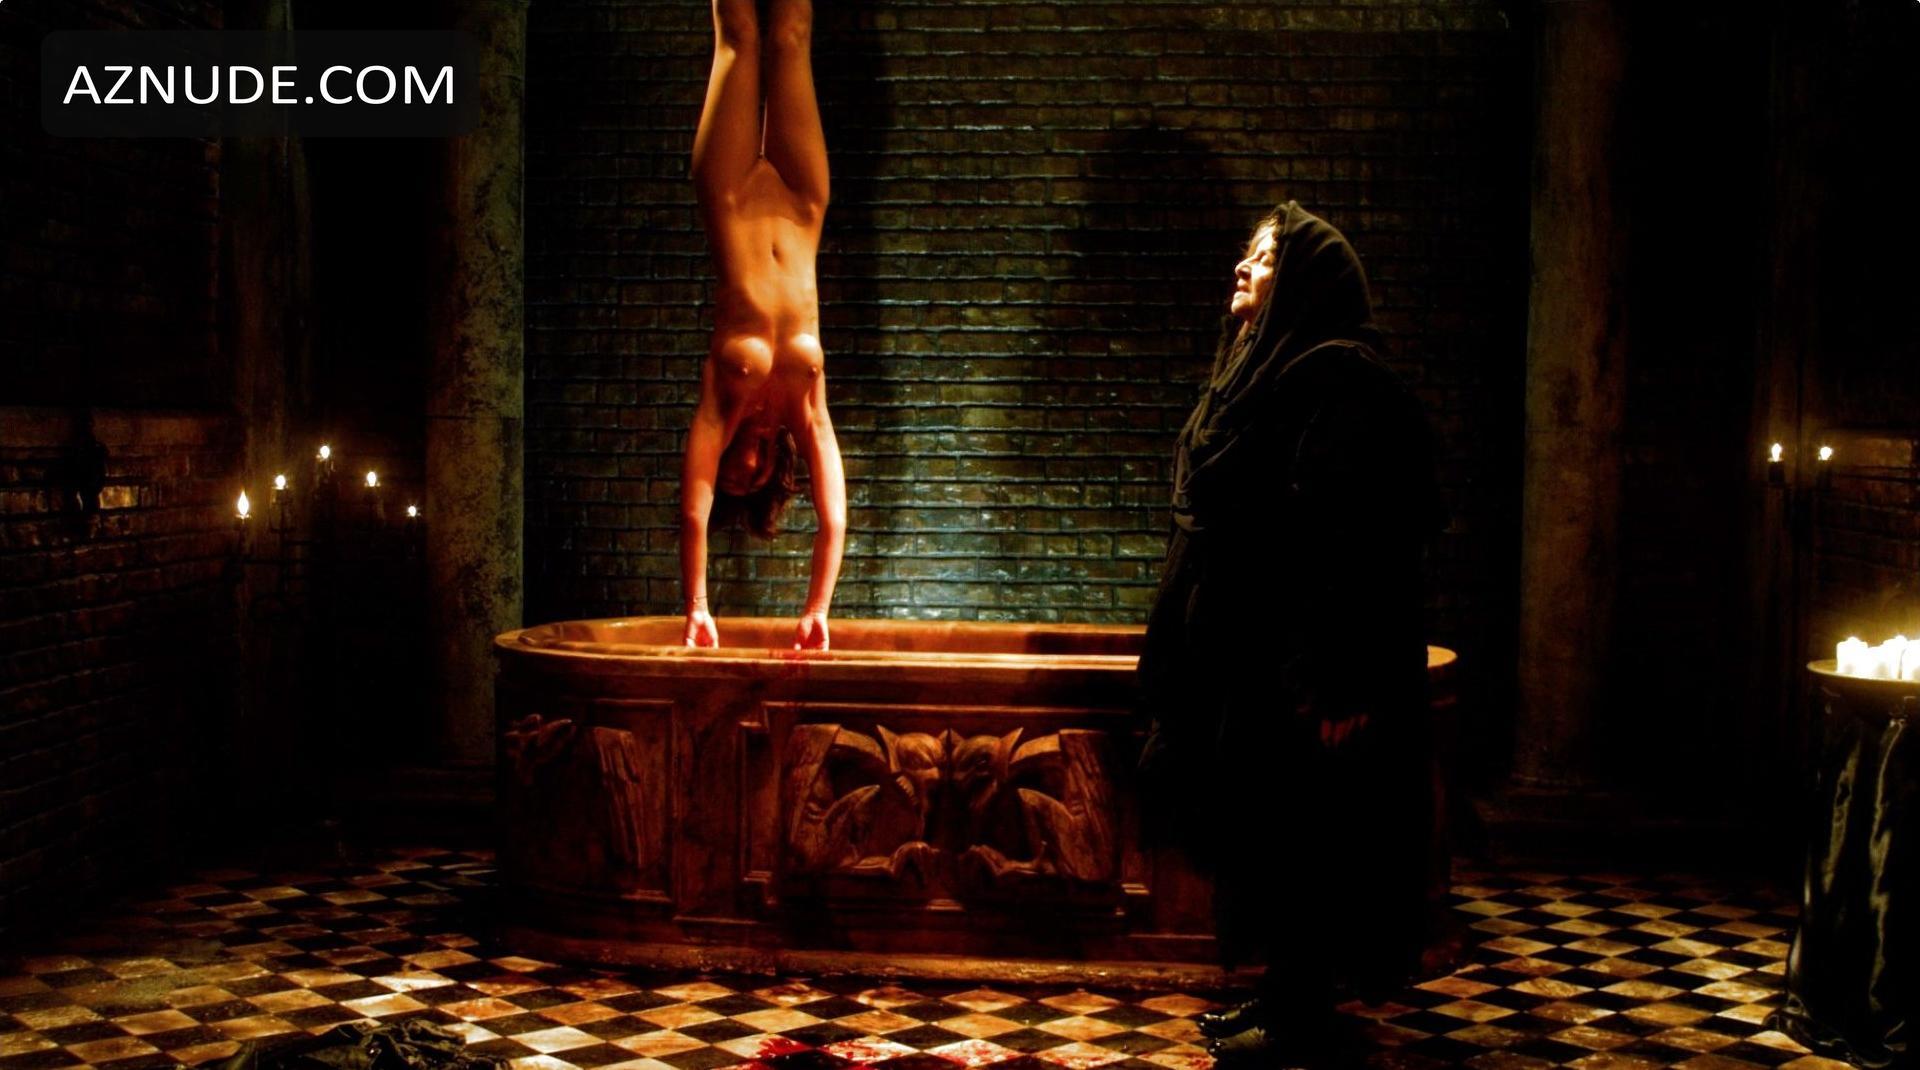 Angelina jolie gia nude photoshoot - 1 part 2